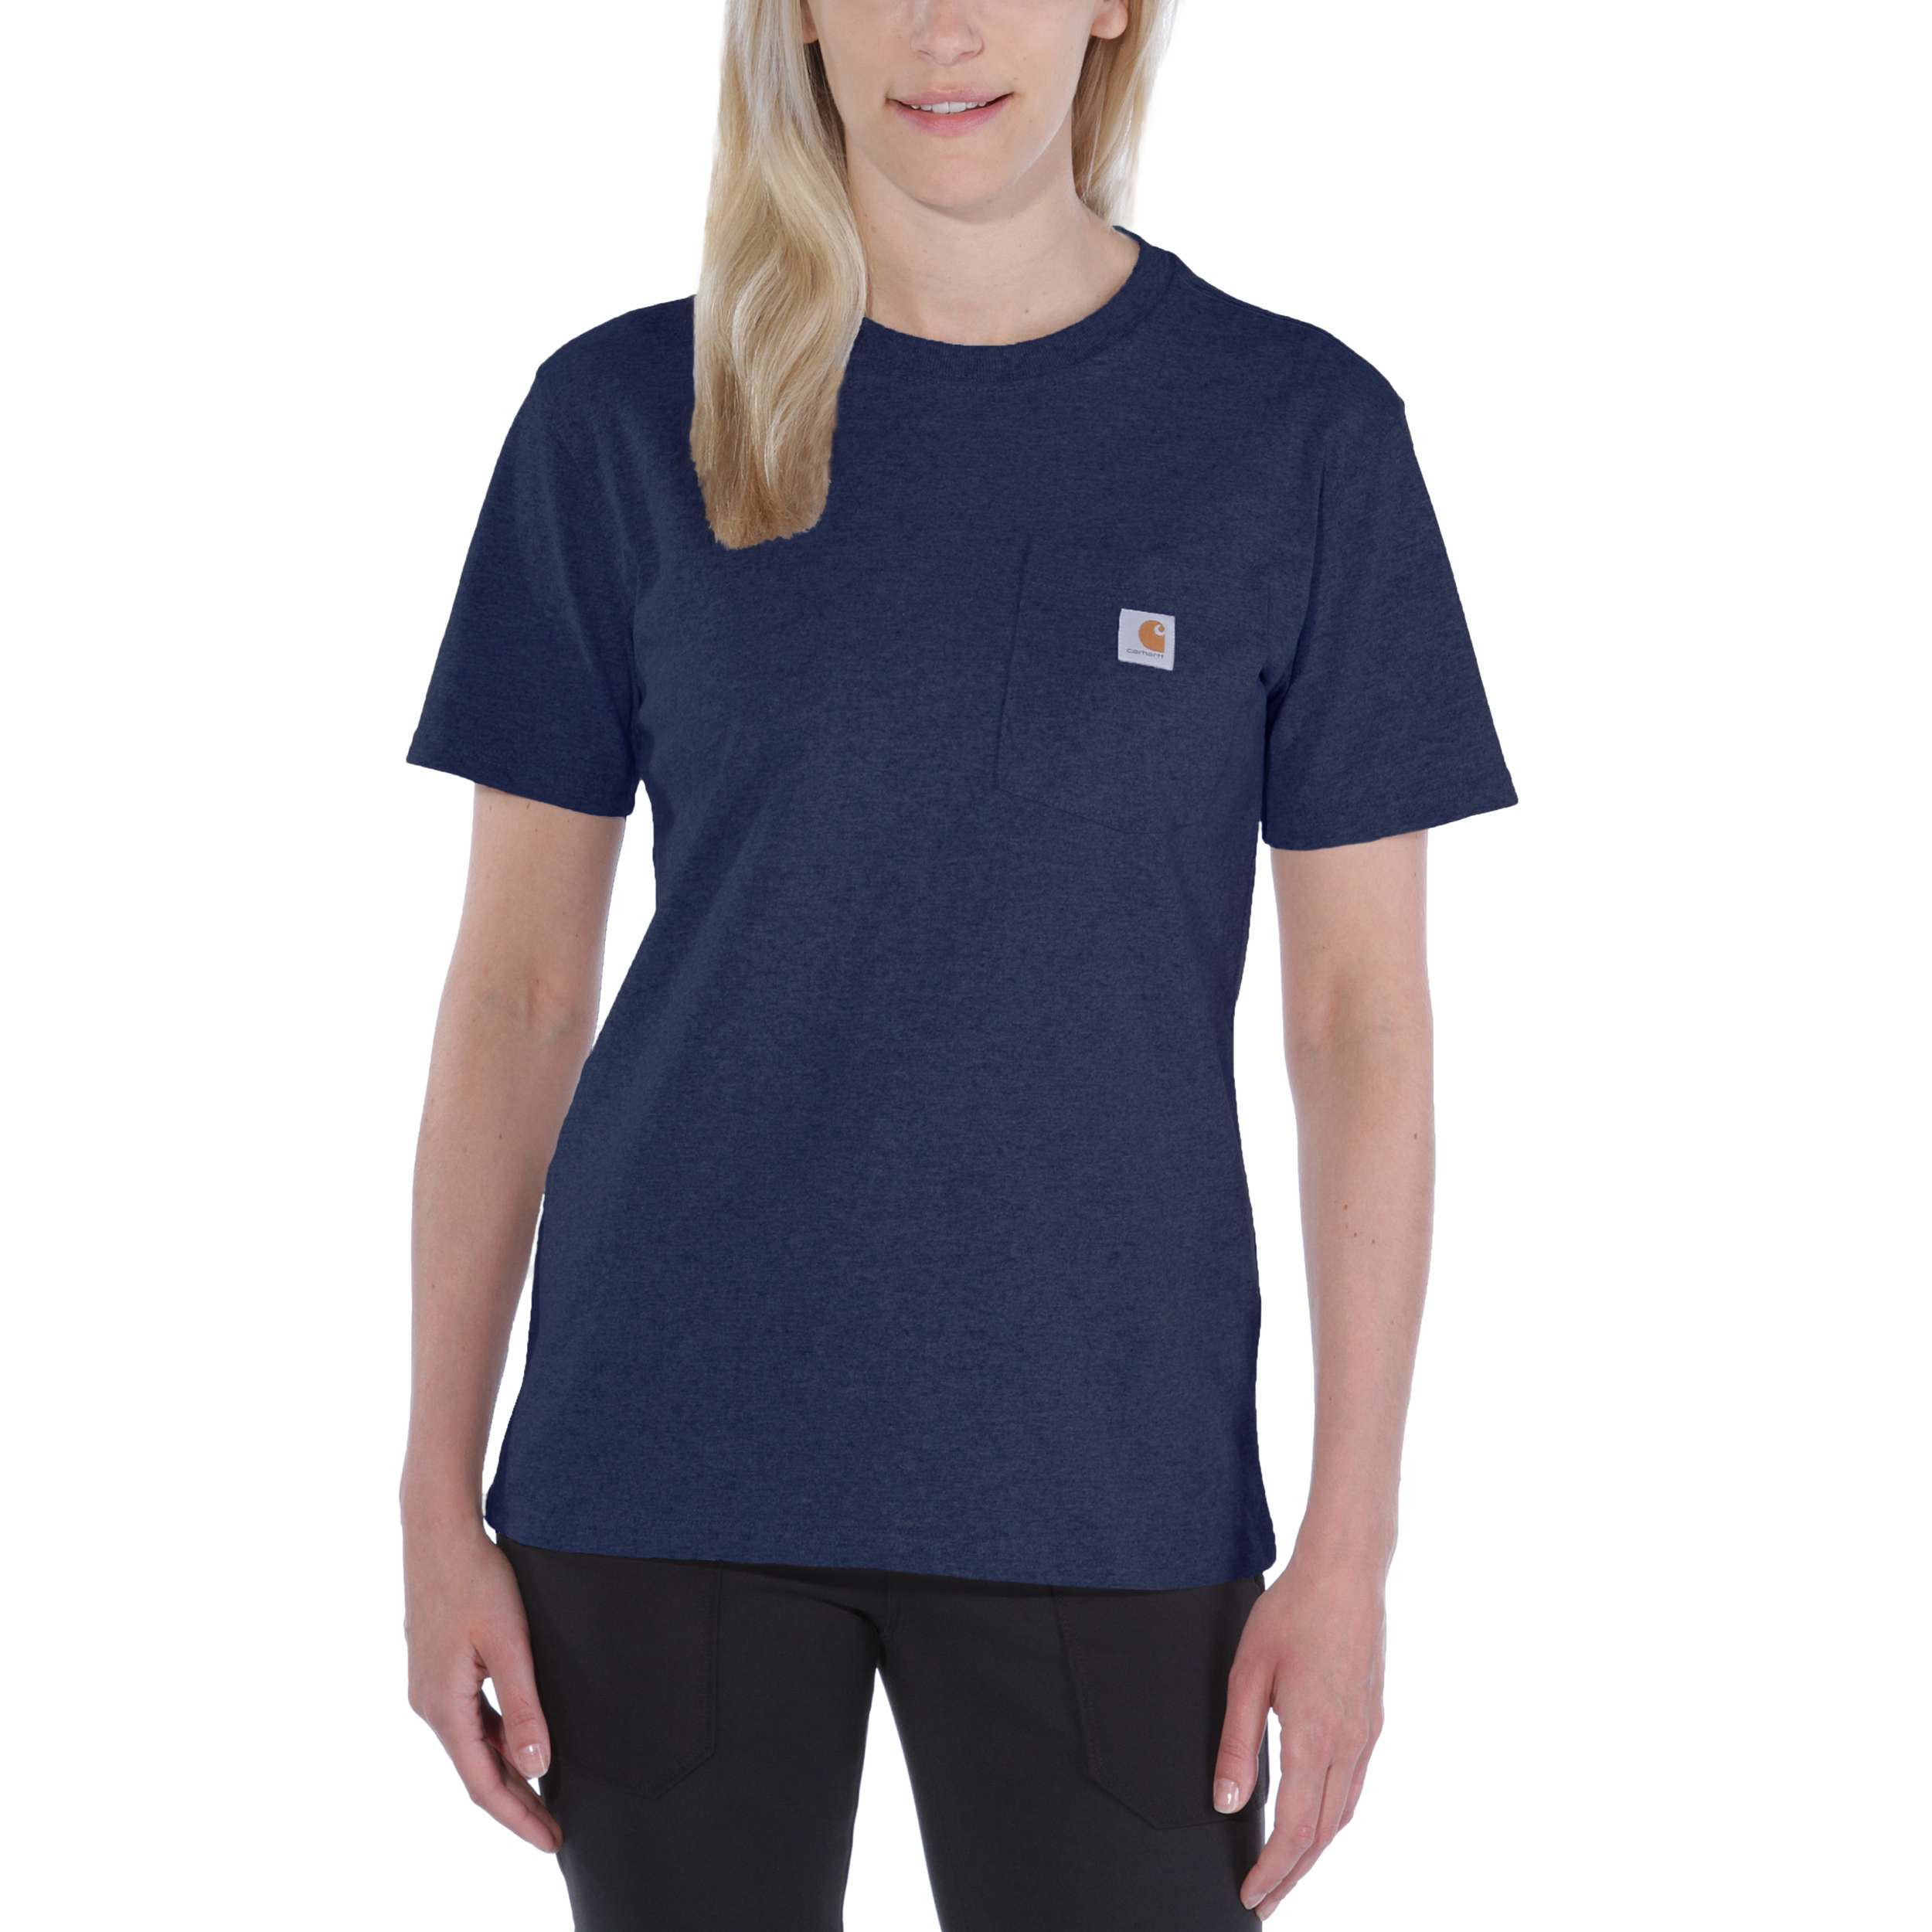 Футболка женская Carhartt WK87 Workwear Pocket T-Shirt - 103067 (Navy, S)